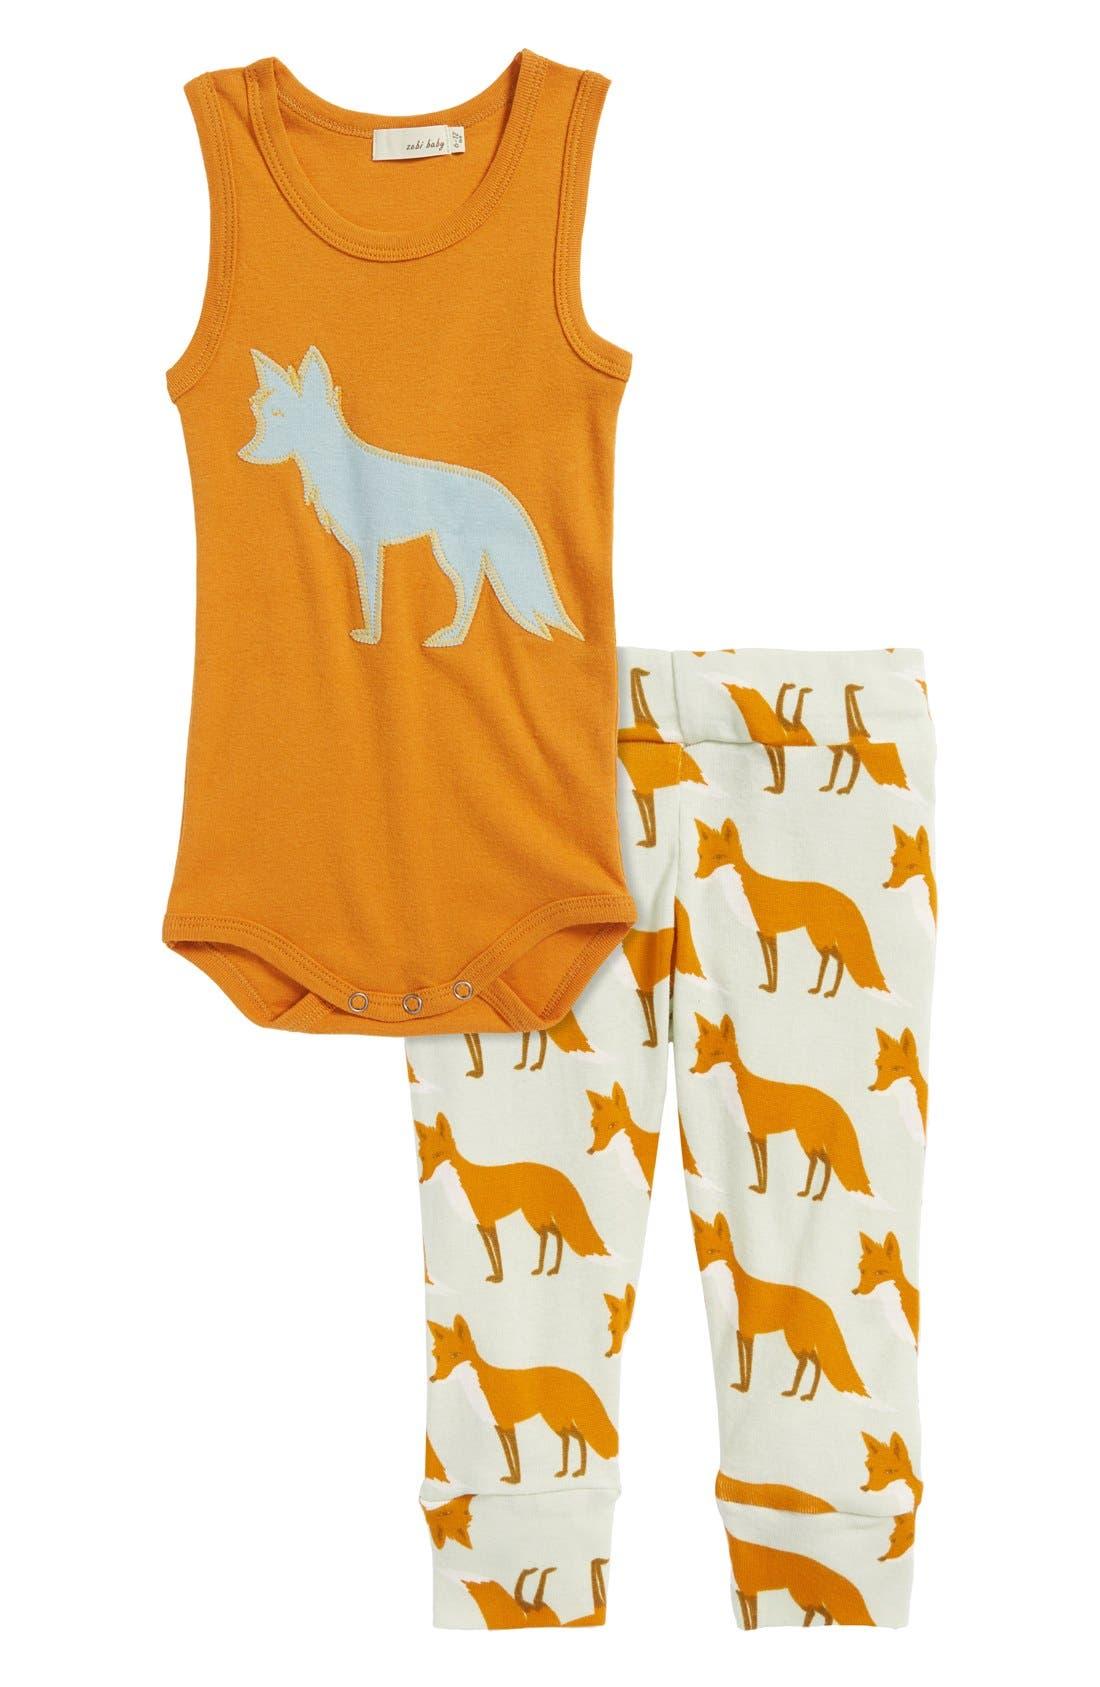 Zebi Baby 'Fox' Organic Cotton Bodysuit,                             Alternate thumbnail 2, color,                             800